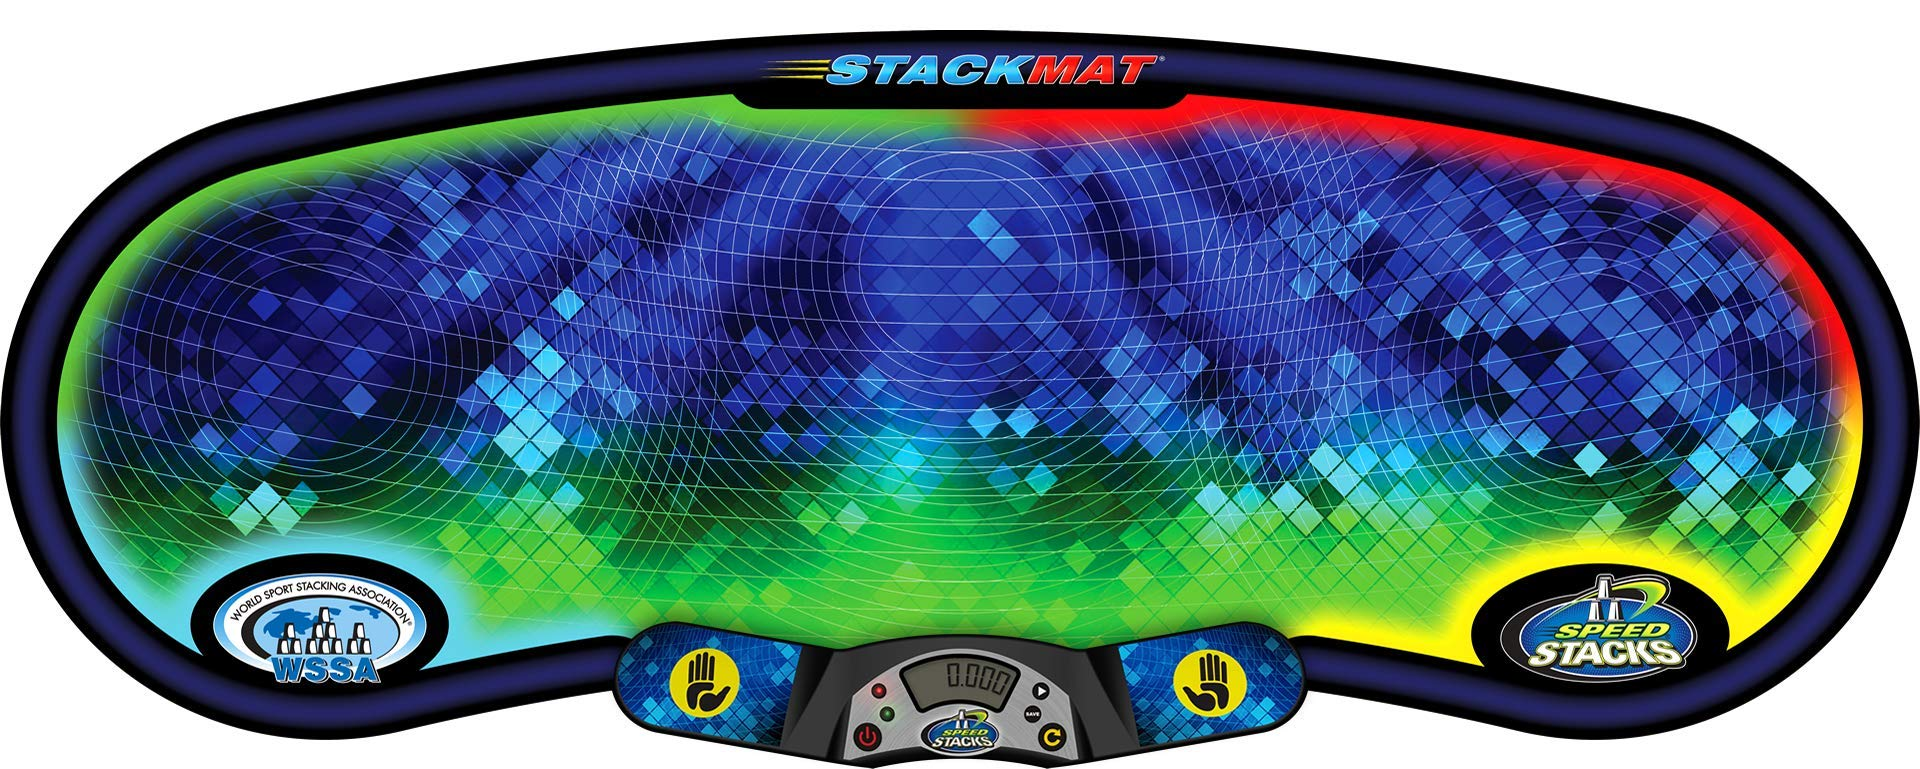 Speed Stacks G4 STACKMAT - Voxel Glow